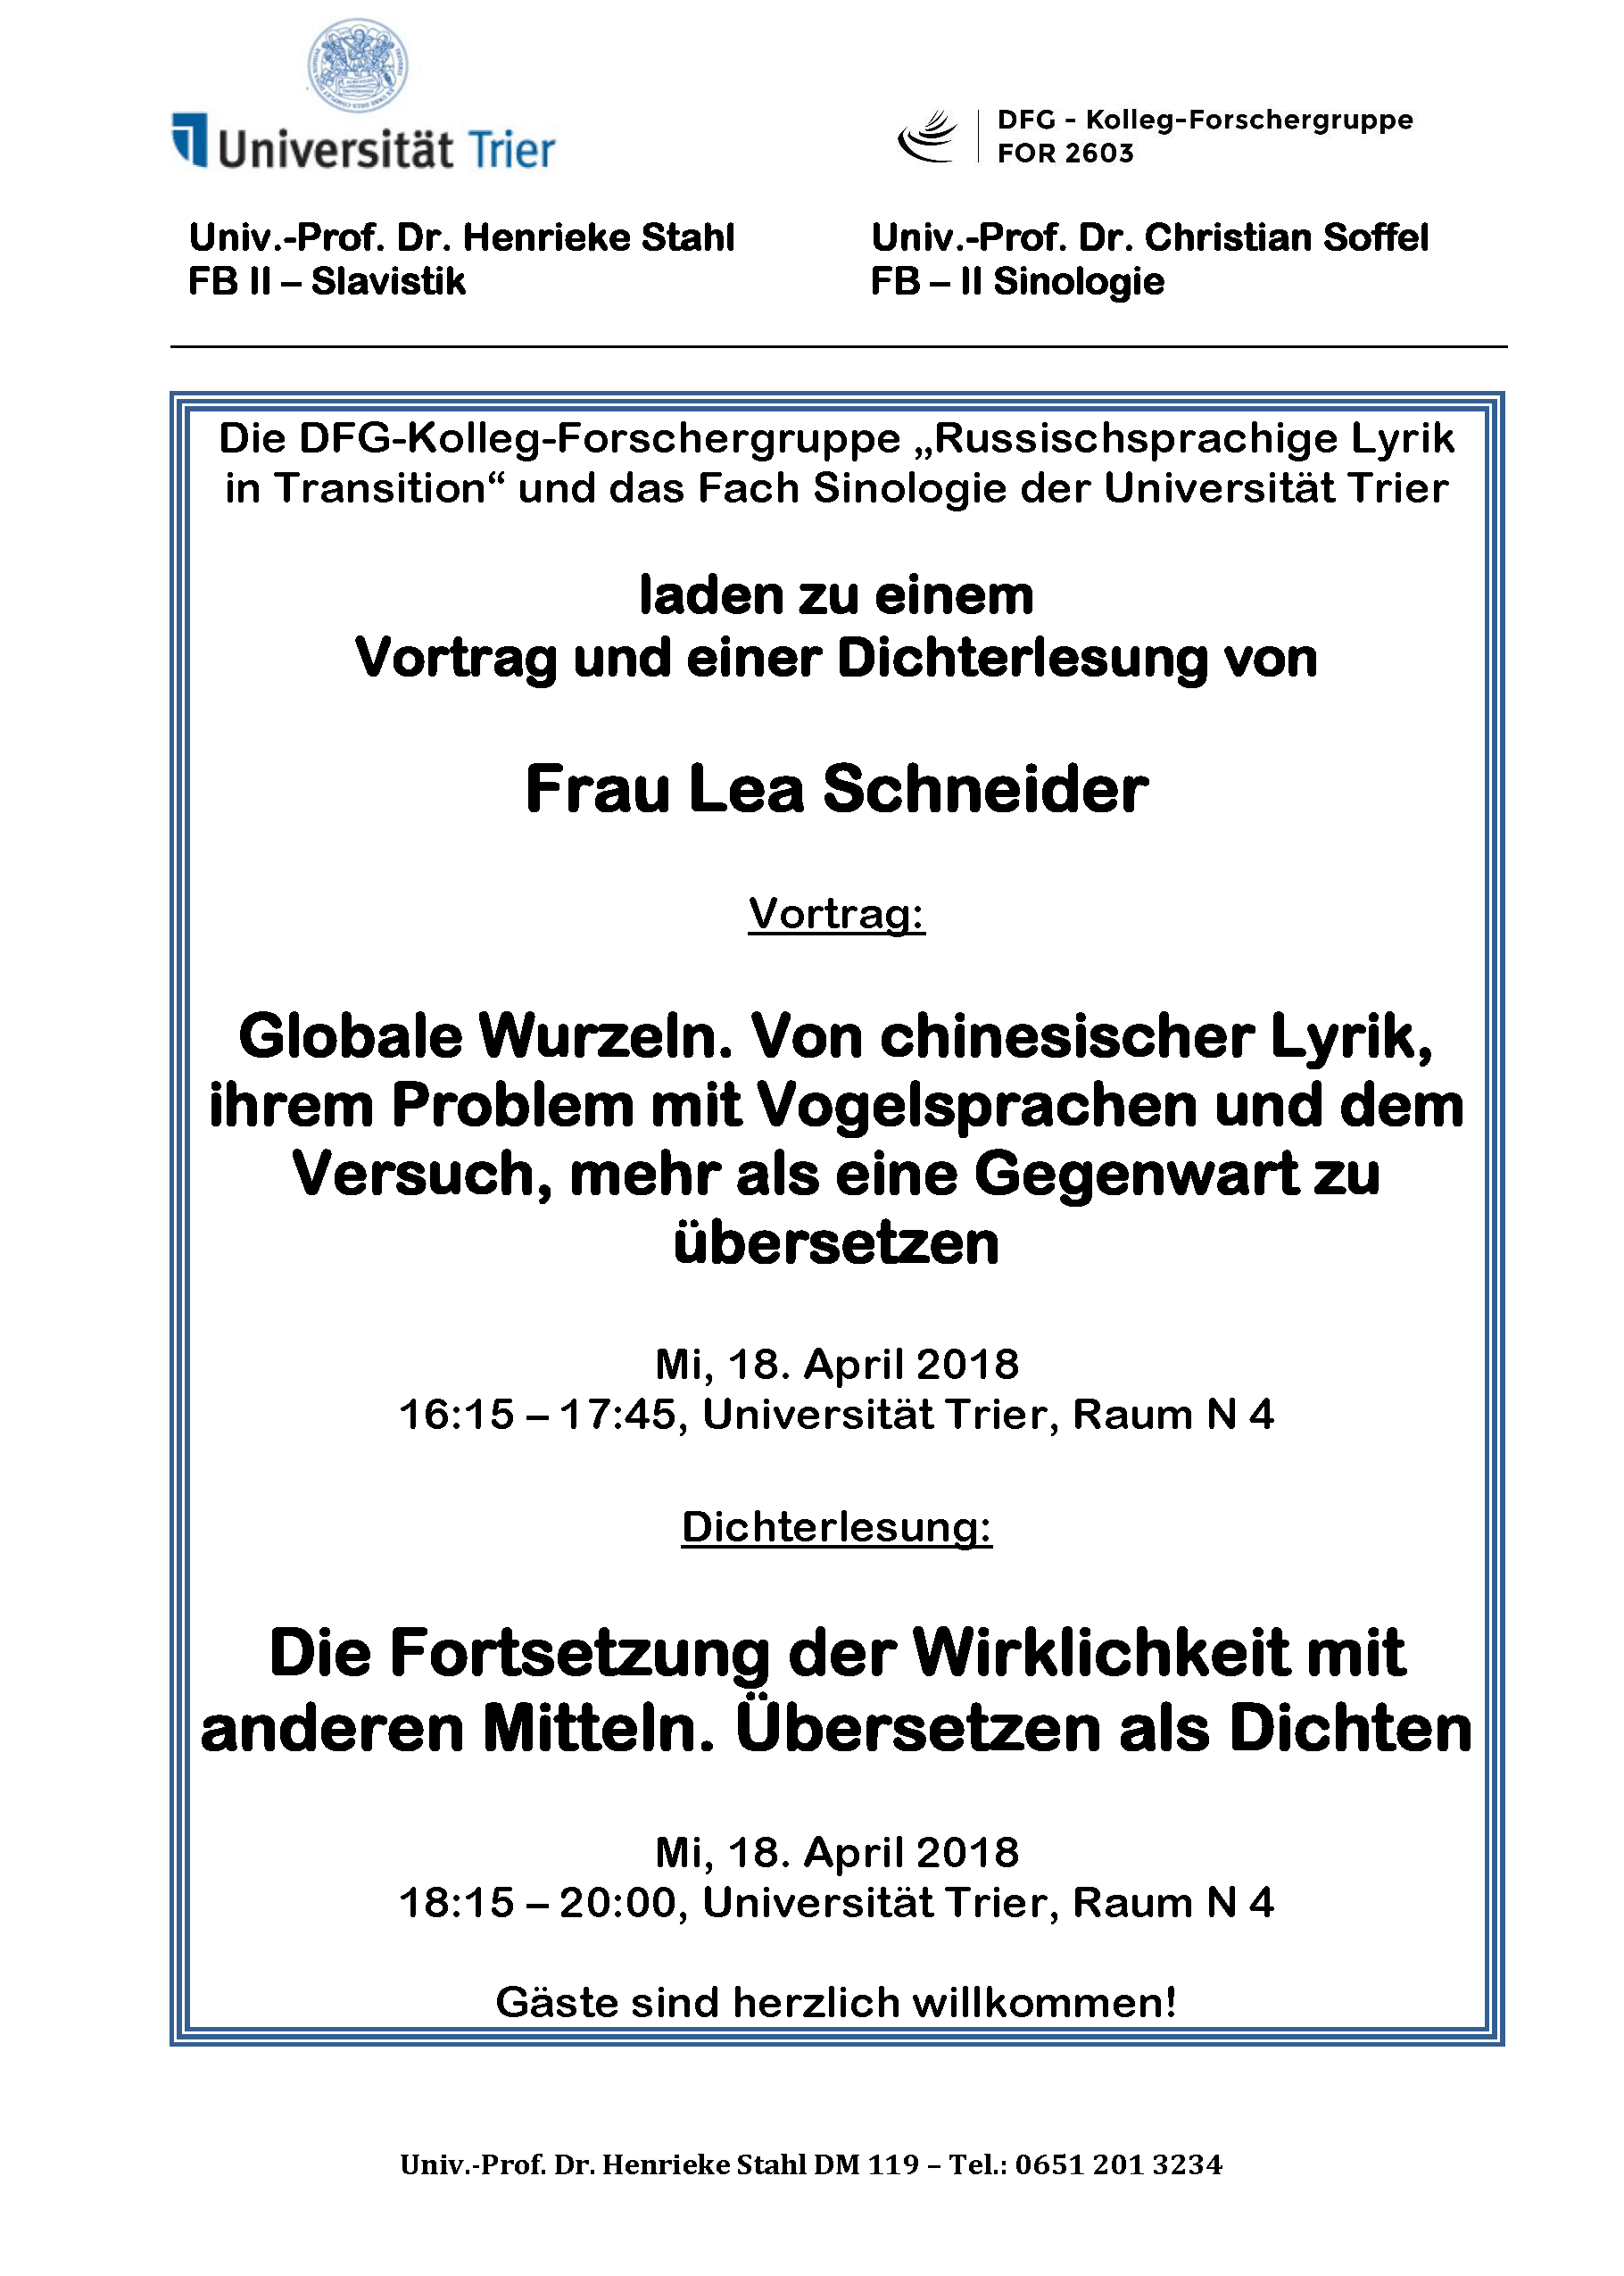 https://lyrik-in-transition.uni-trier.de/wp-content/uploads/2018/03/Plakat-Schneider.png